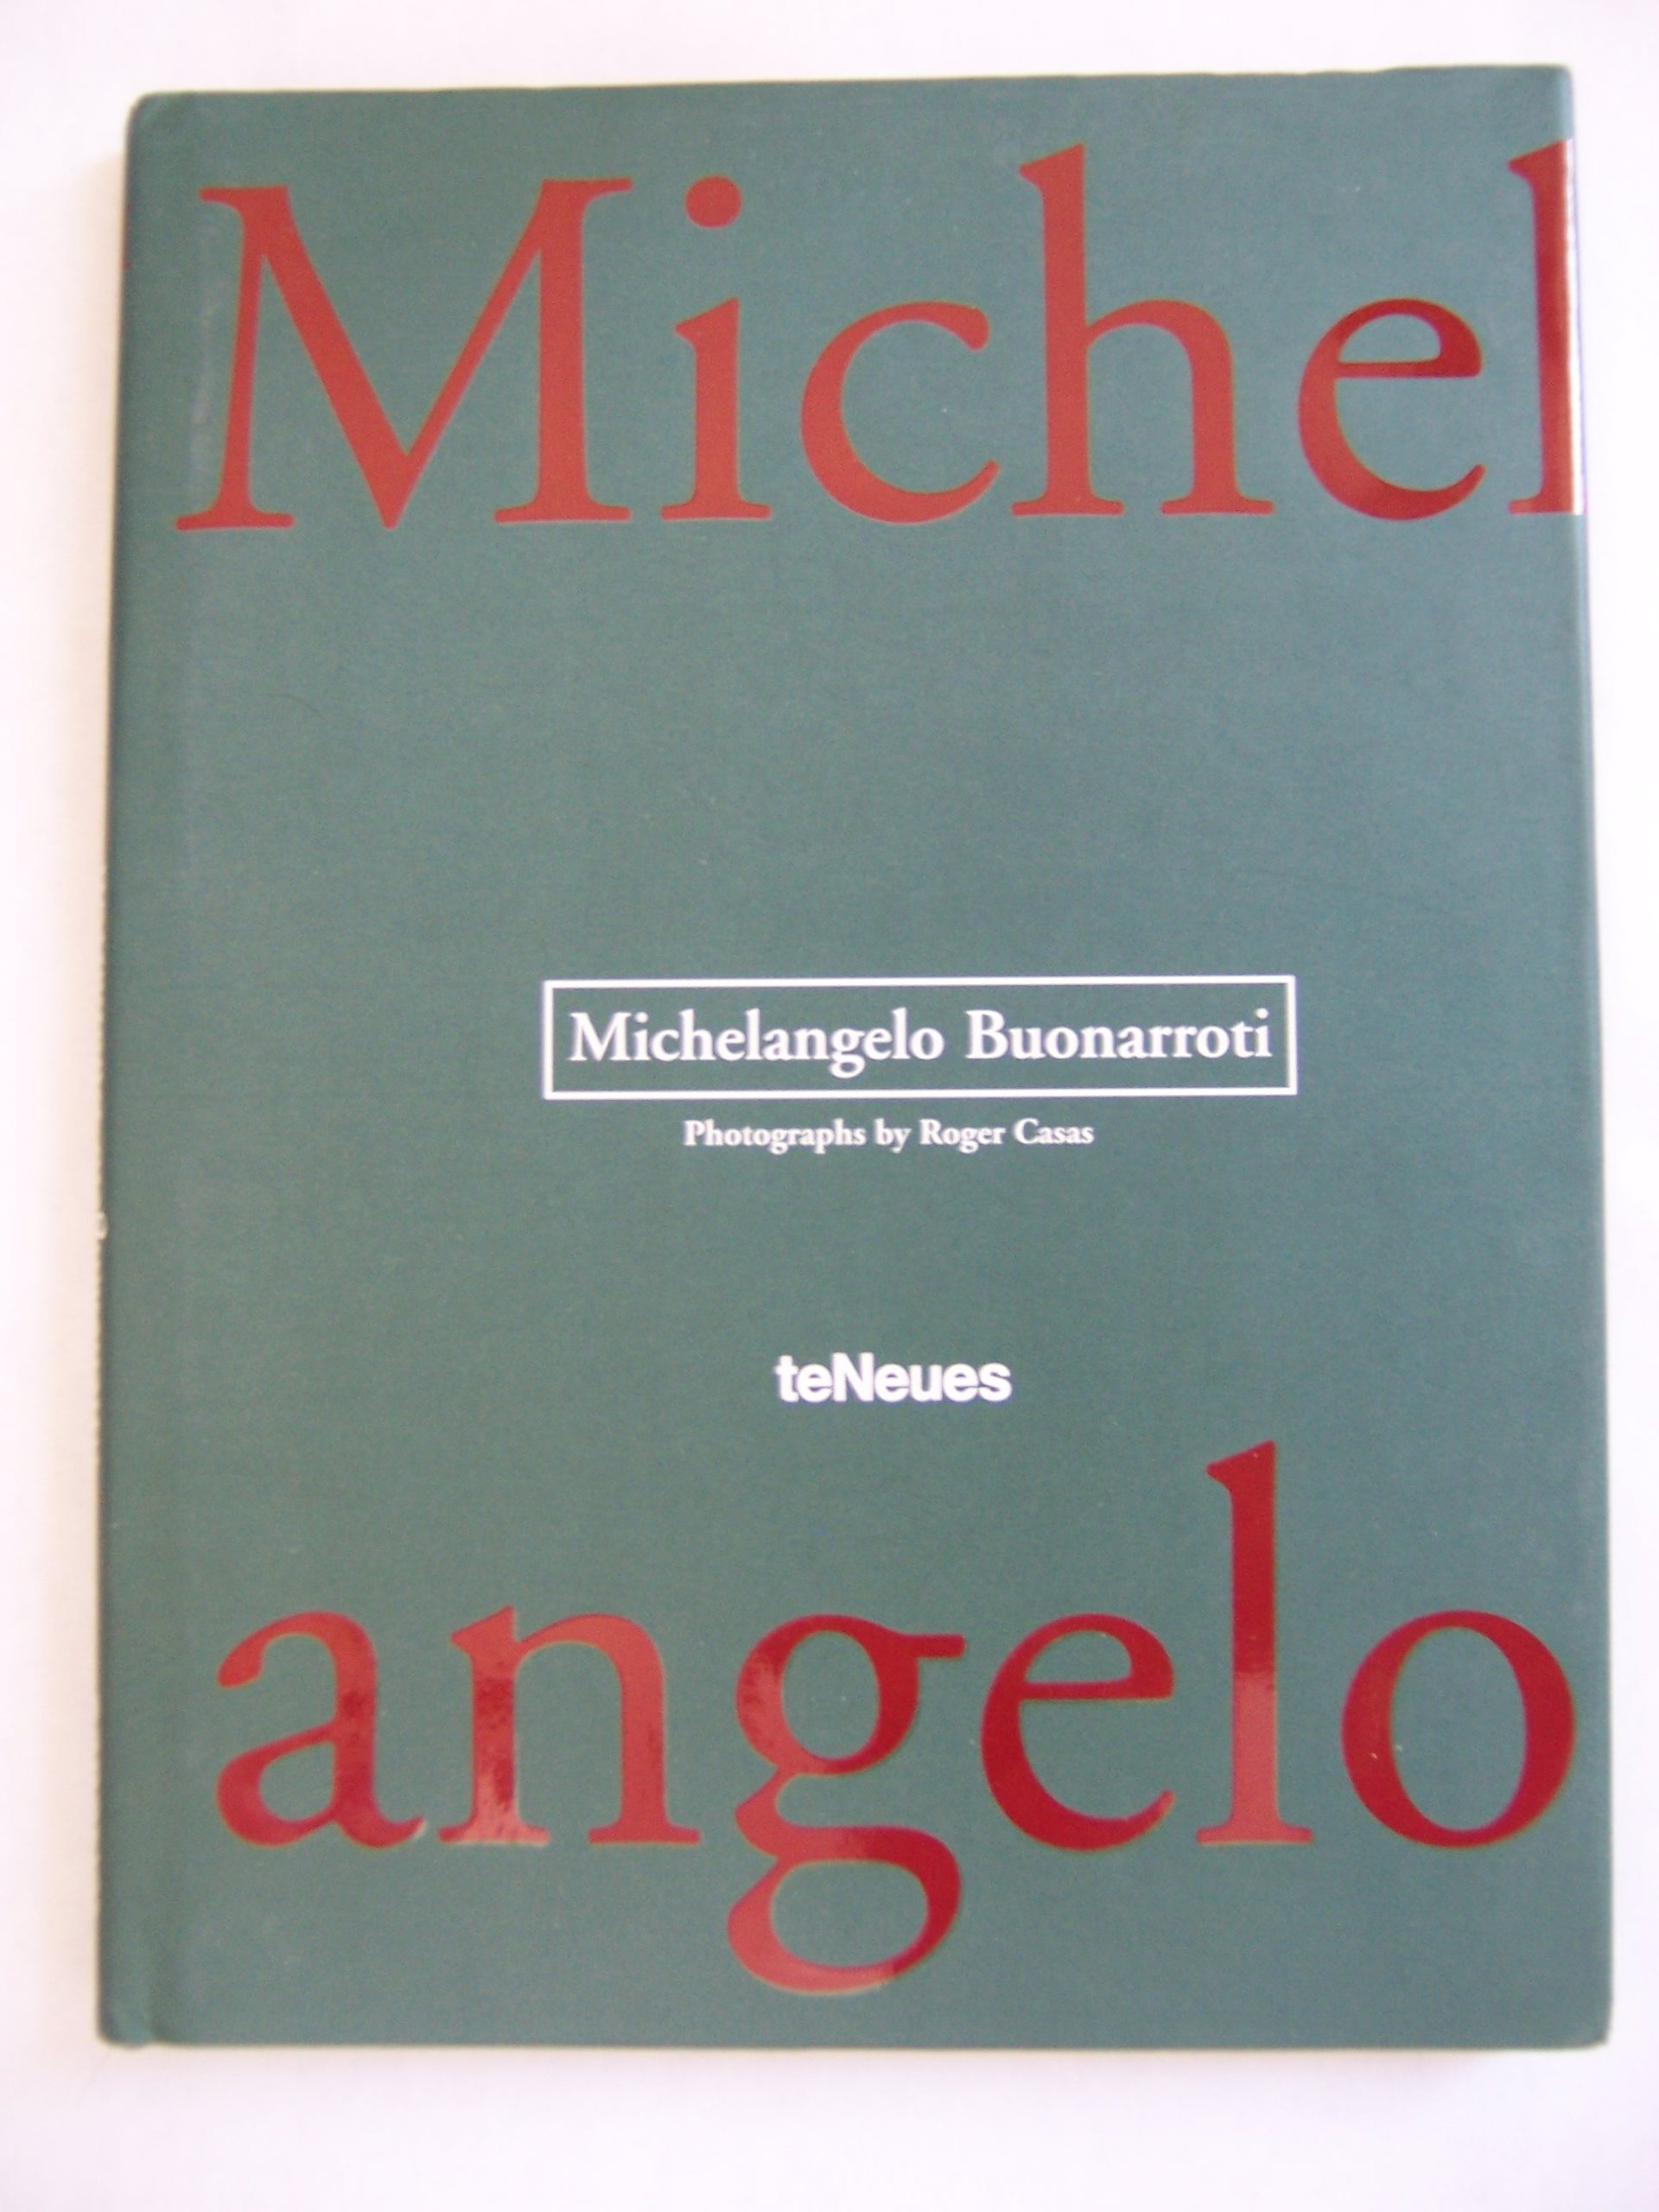 michelangelo buonarroti 7 x 9 80 page book